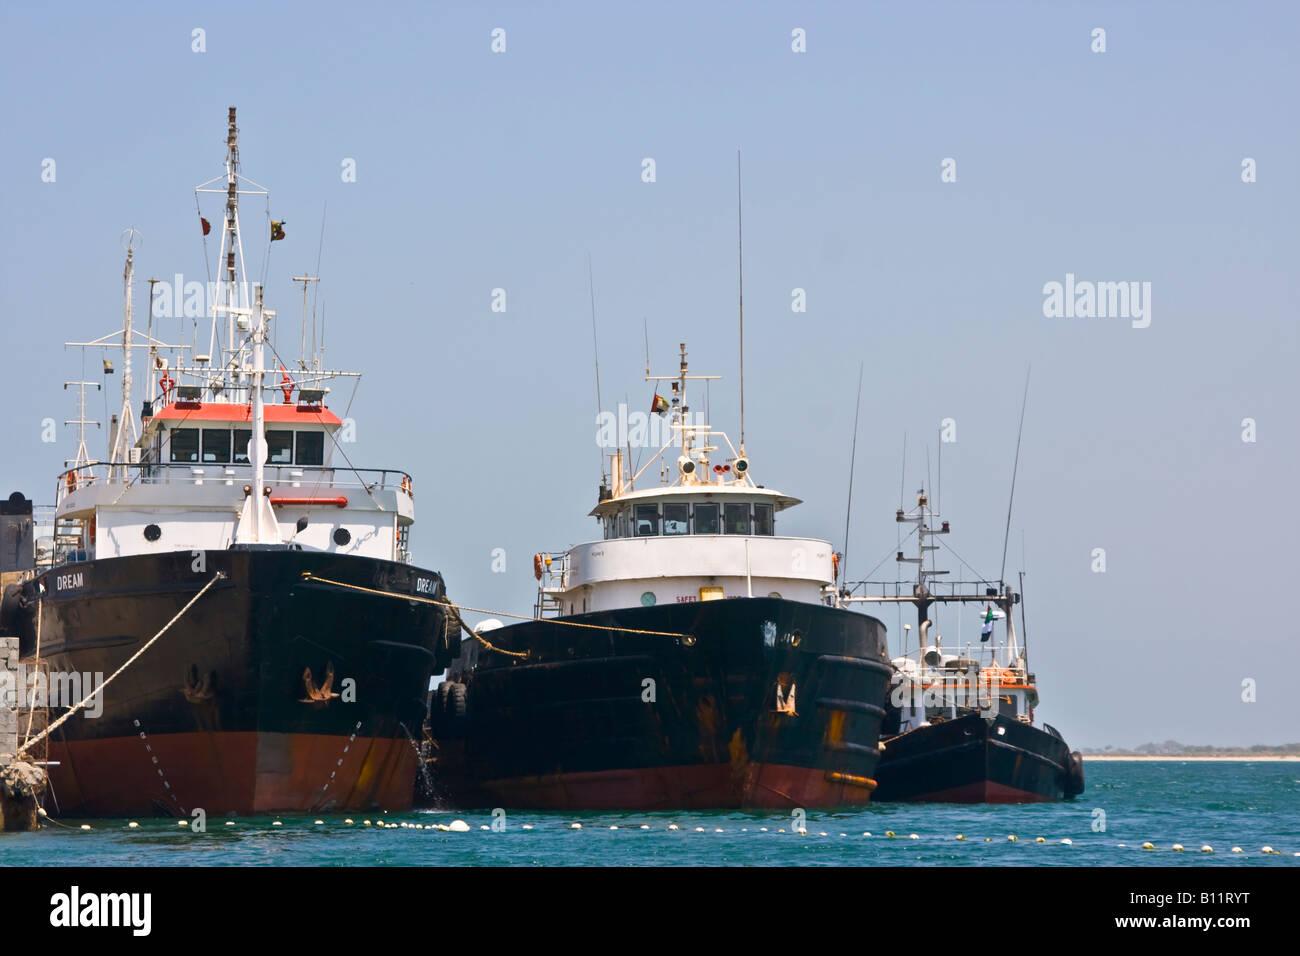 Fish aquarium in umm al quwain - Ships Old Port Umm Al Quwain United Arab Emirates Stock Image